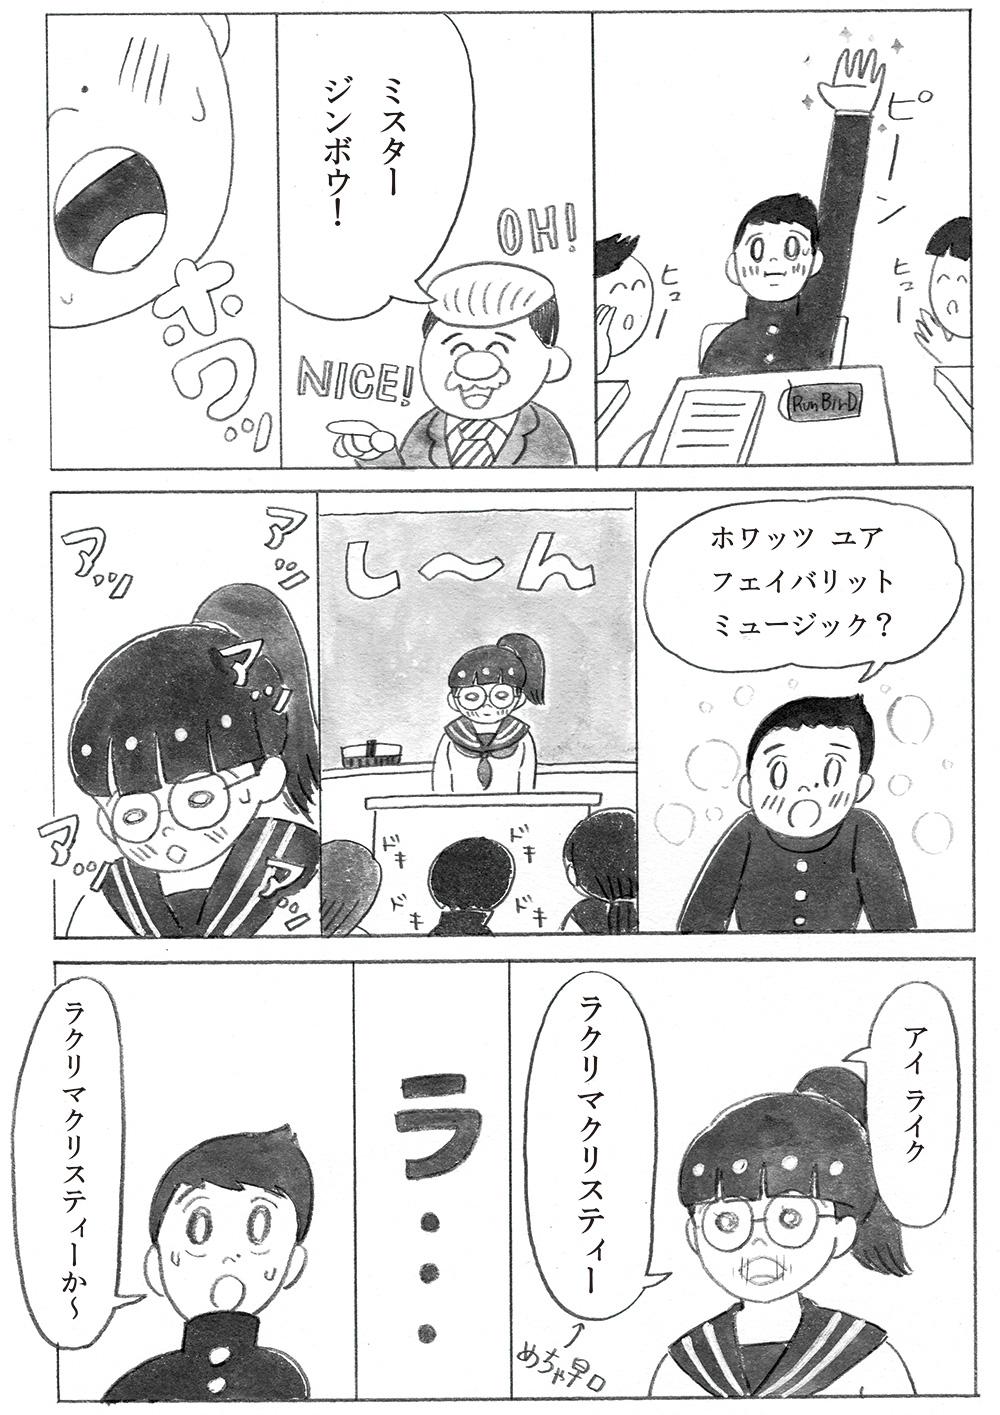 jimbo_satoshi_meetia05_2